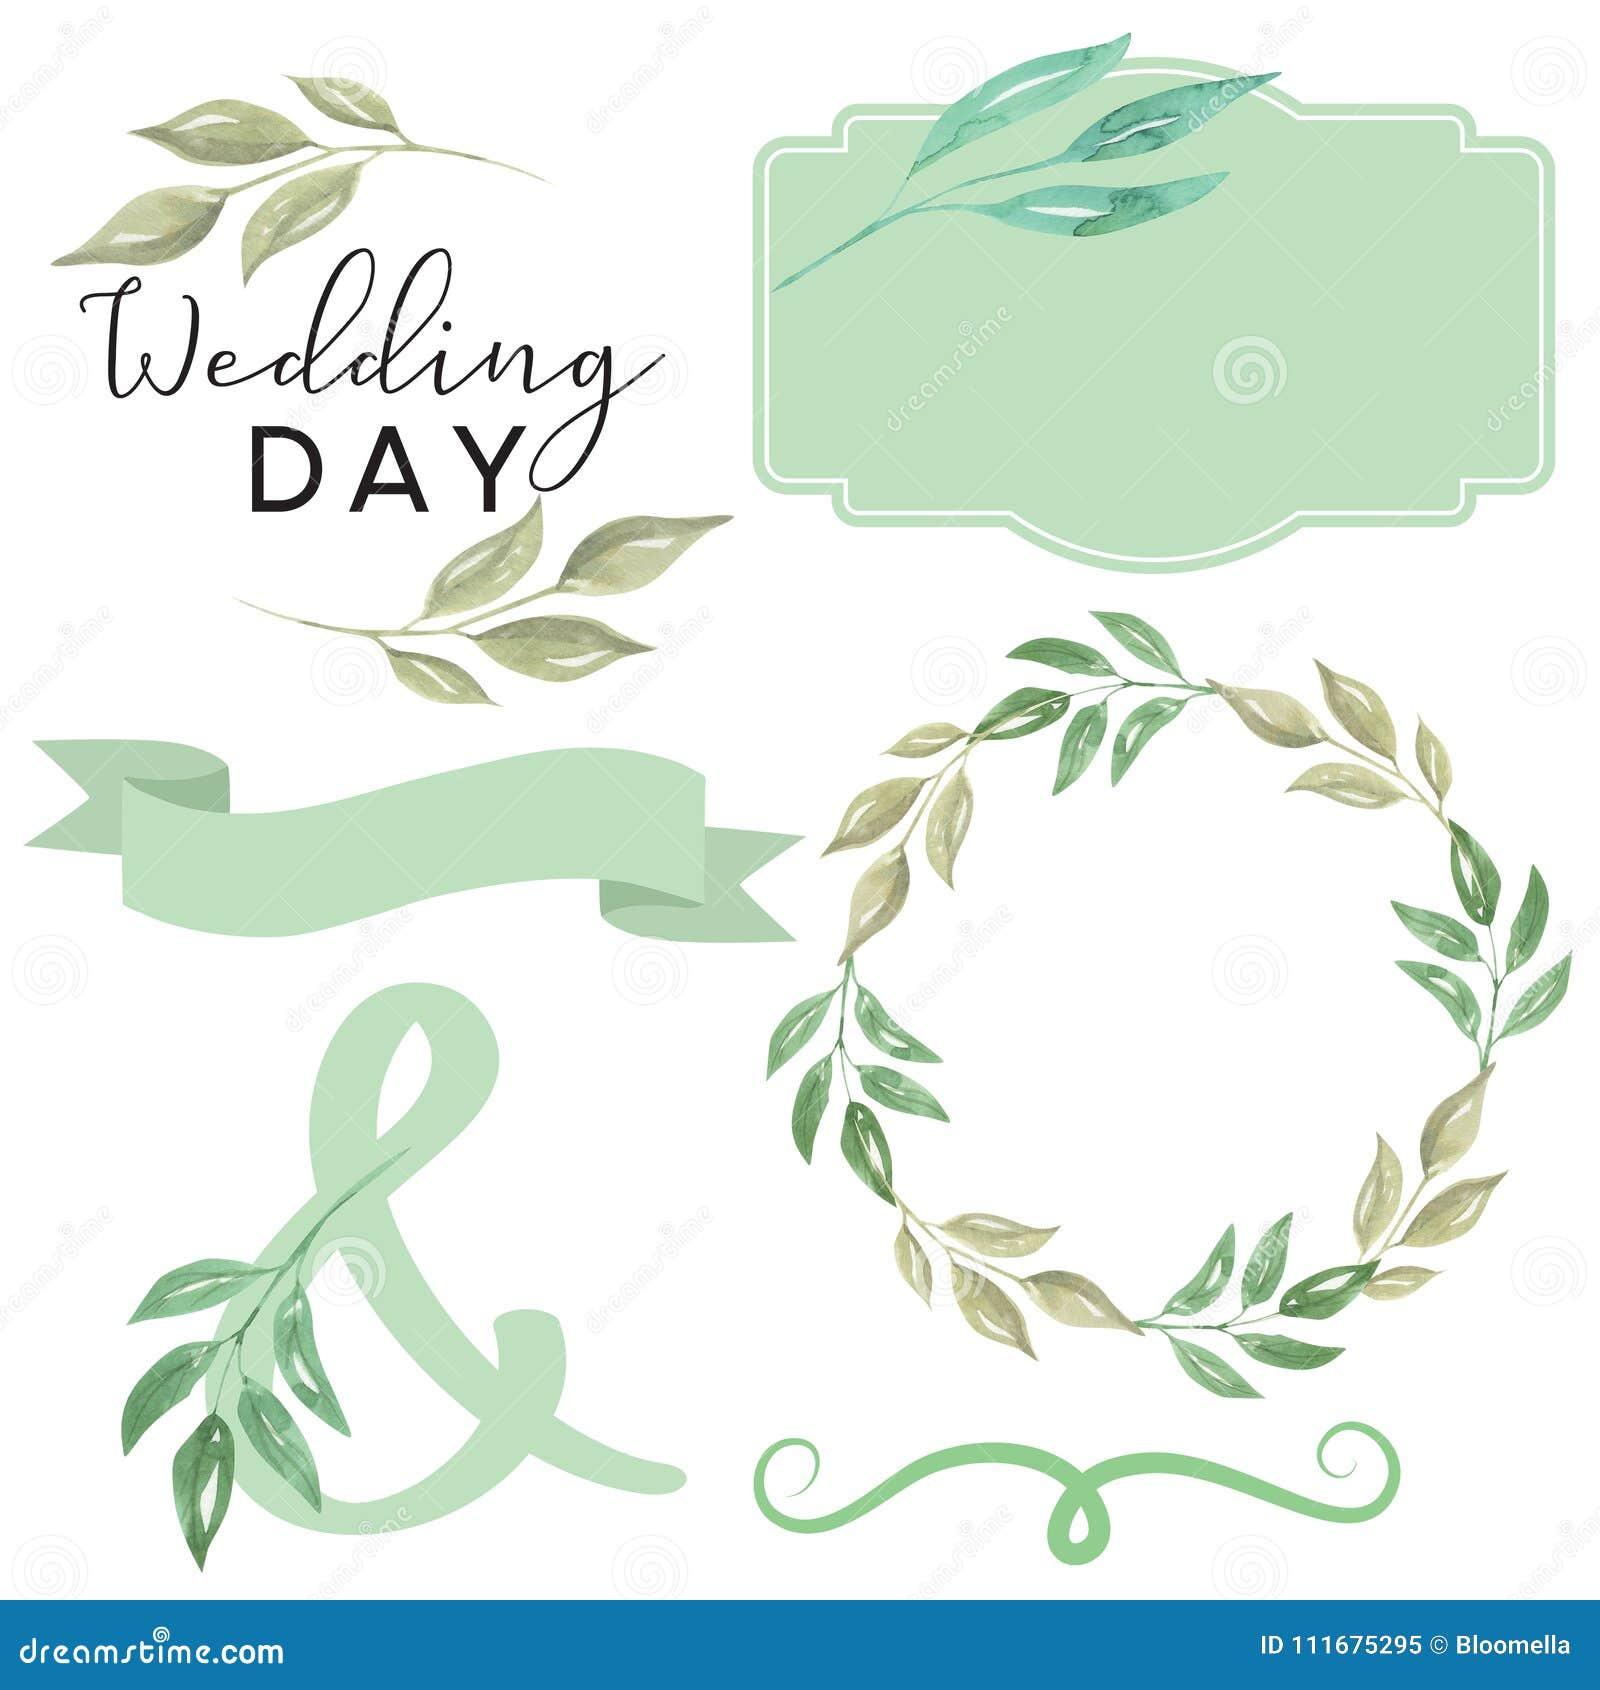 watercolor wedding day foliage leaves leaf scroll banner wreath